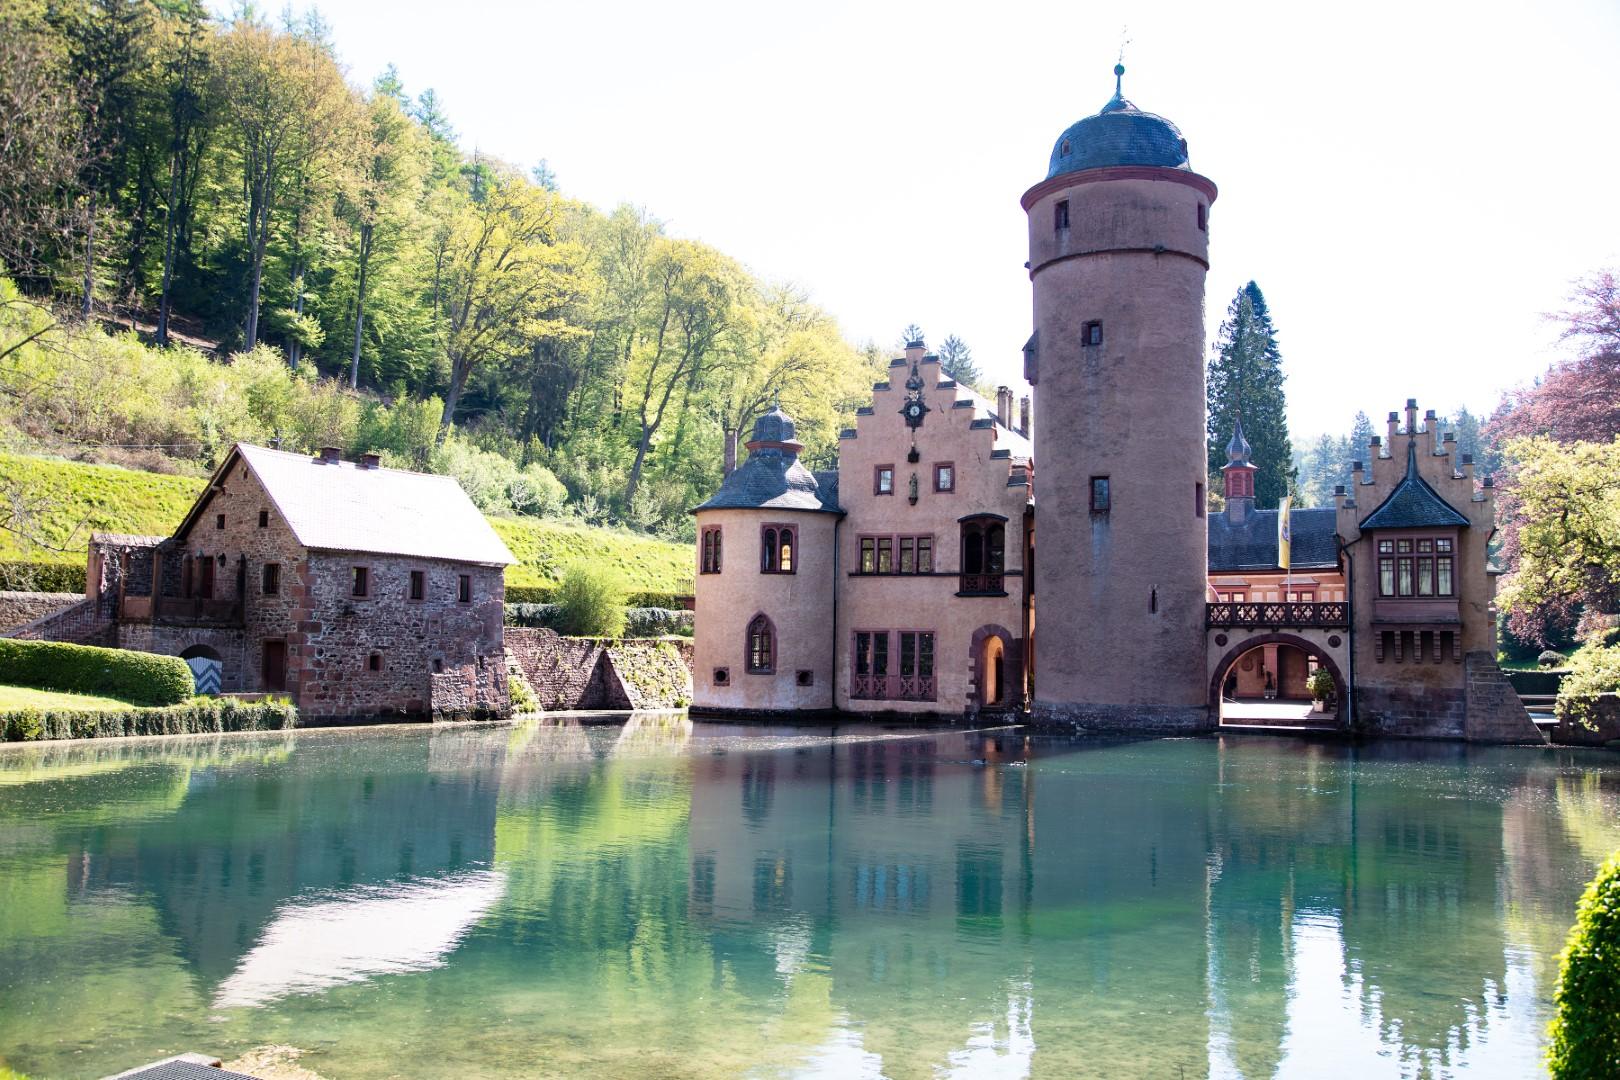 Off the beaten path Germany castles: mespelbrunn